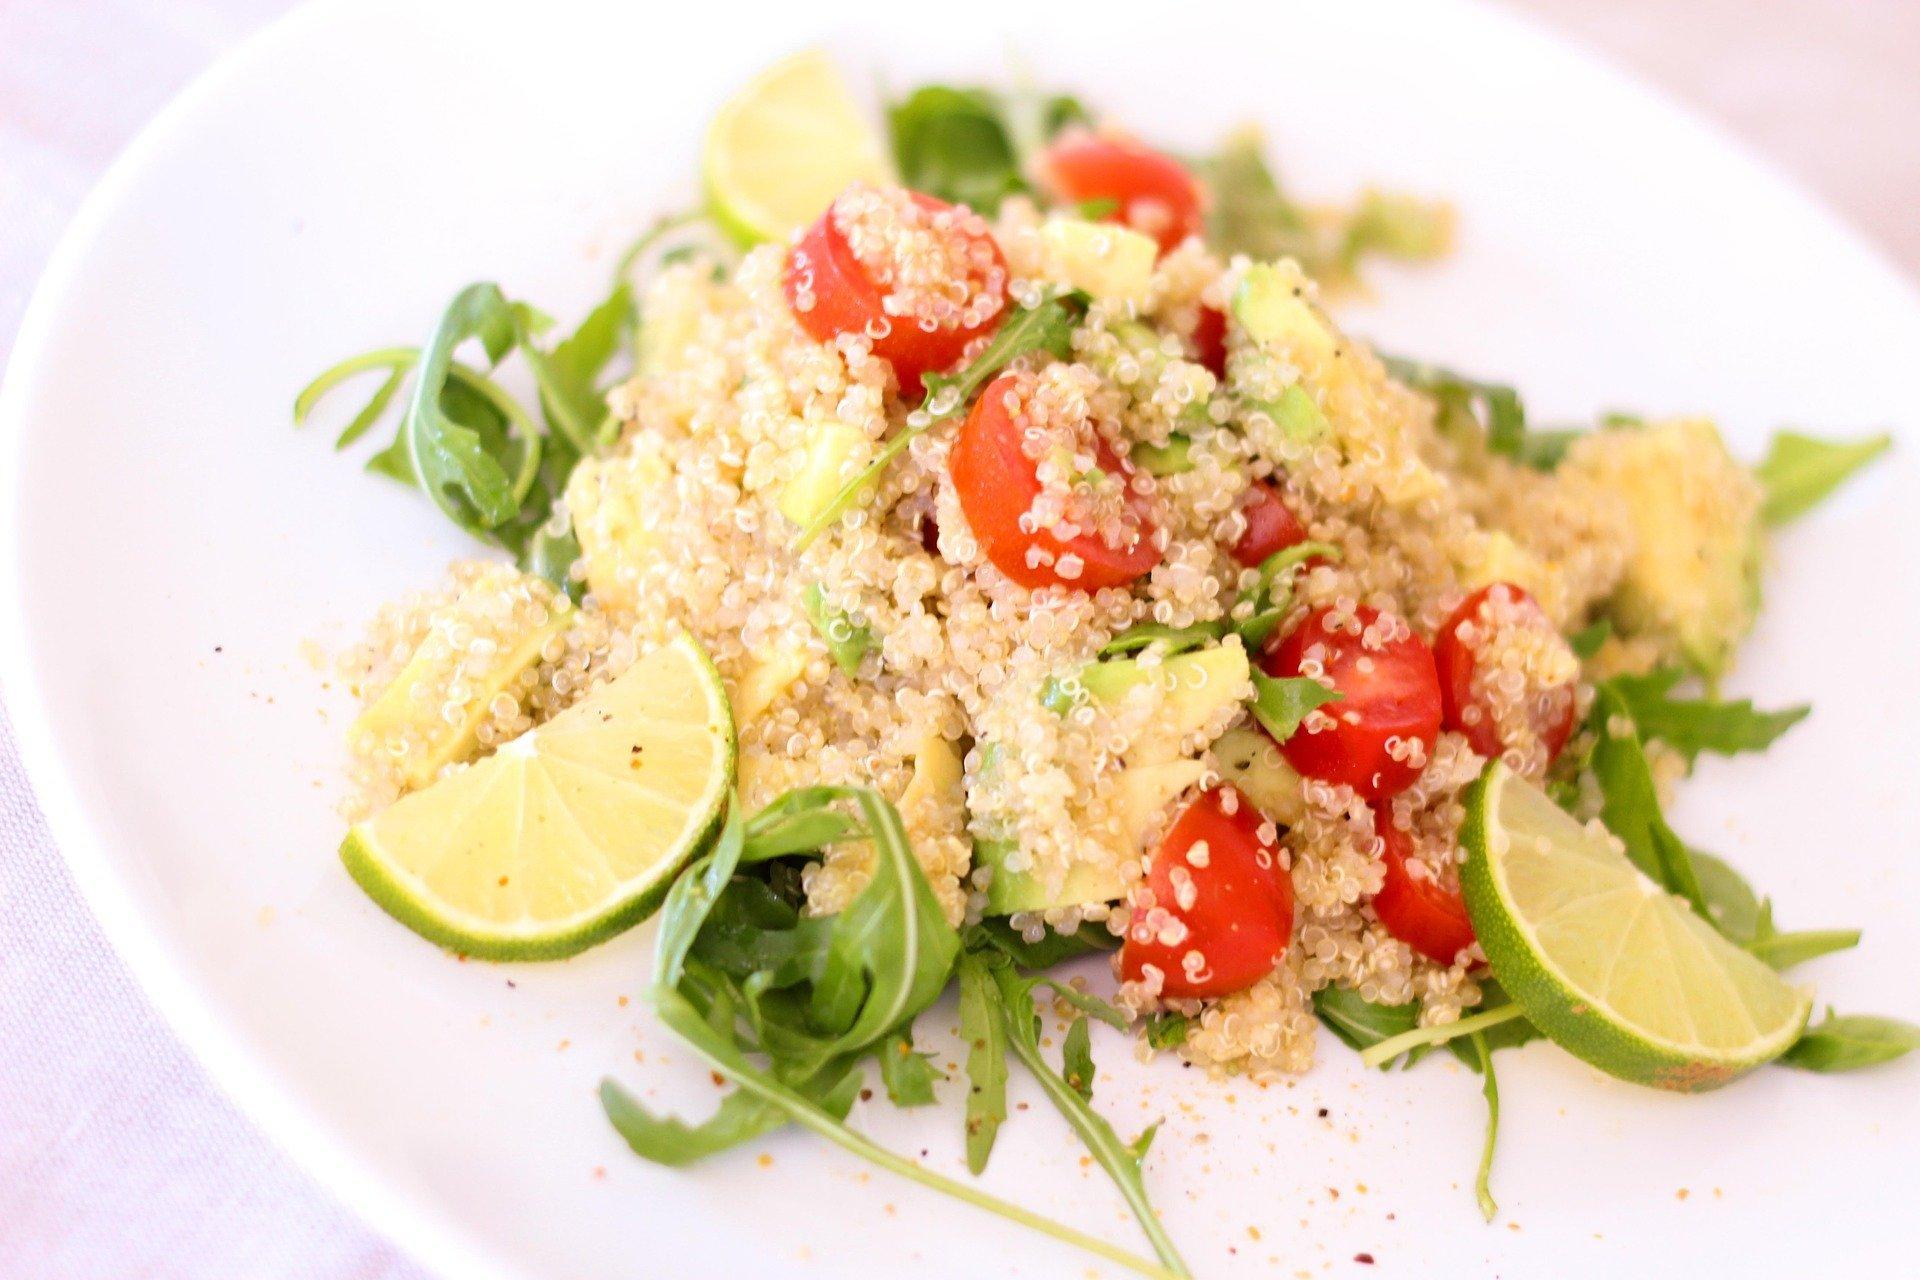 Quinoa-Salat mit Rucola, Tomaten und Feta